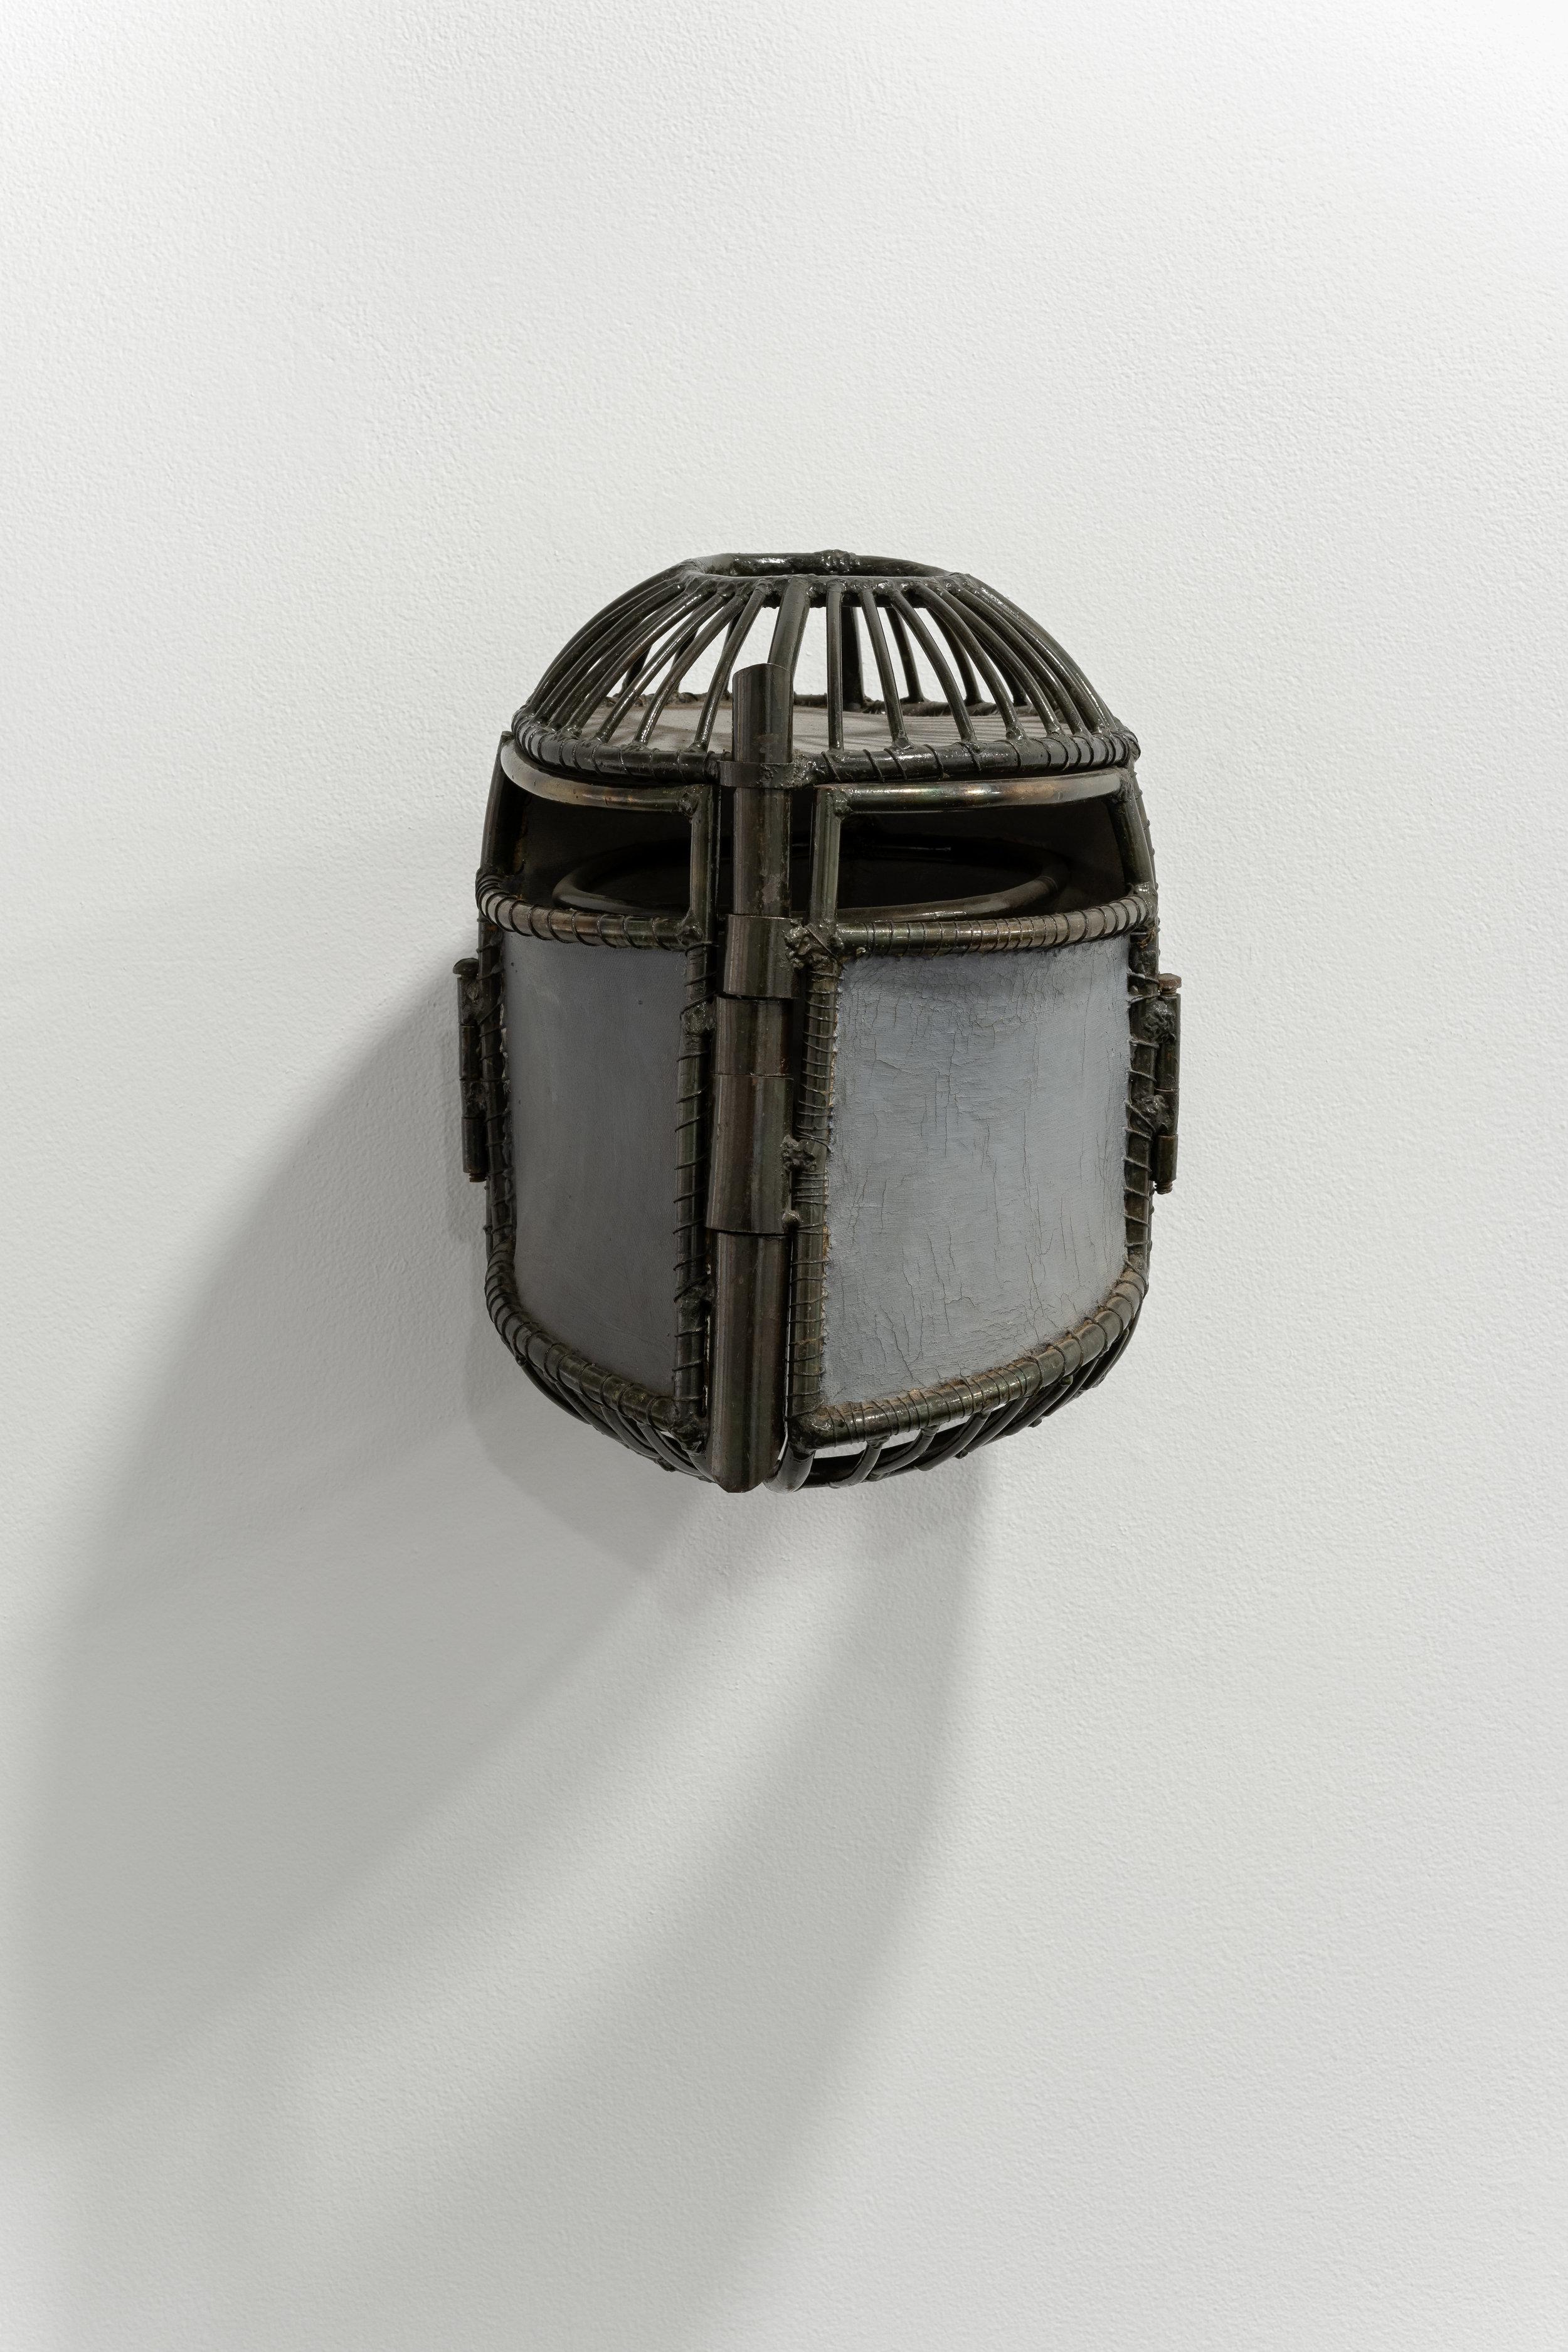 Helene Brandt  Head Chamber , 1980s, Steel, fabric, 11 1/2 x 22 x 7 inches